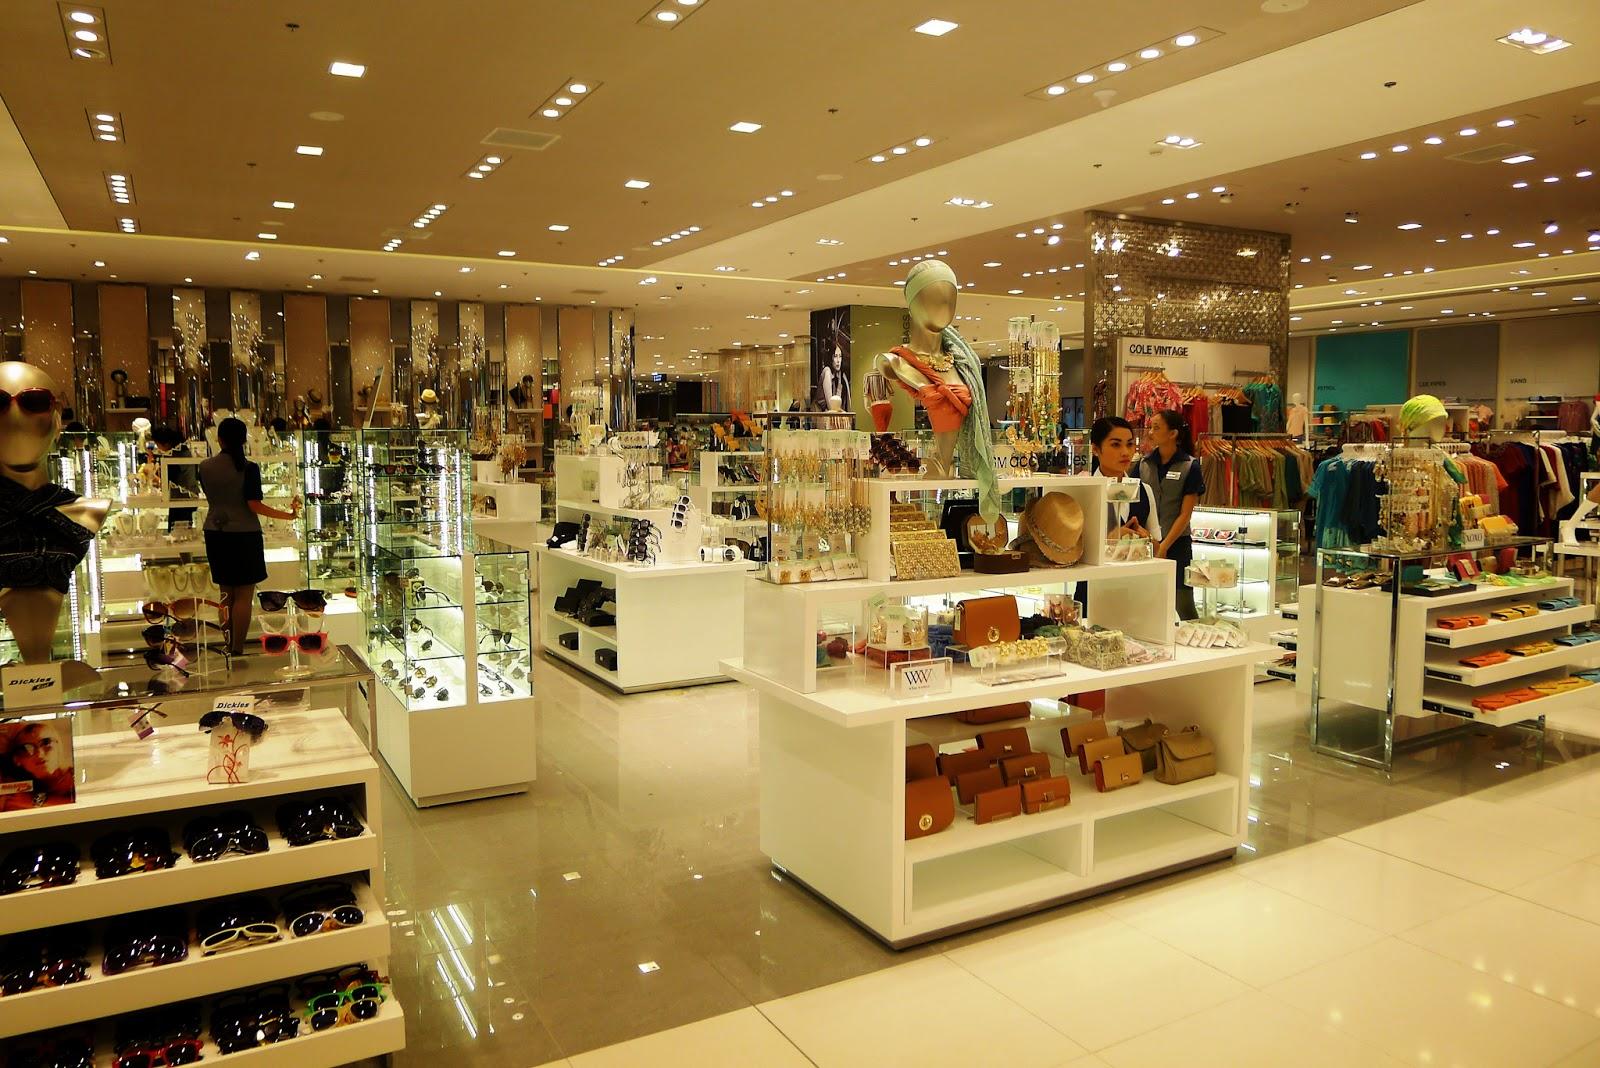 cb3d1b6caa21 Women s accessories section